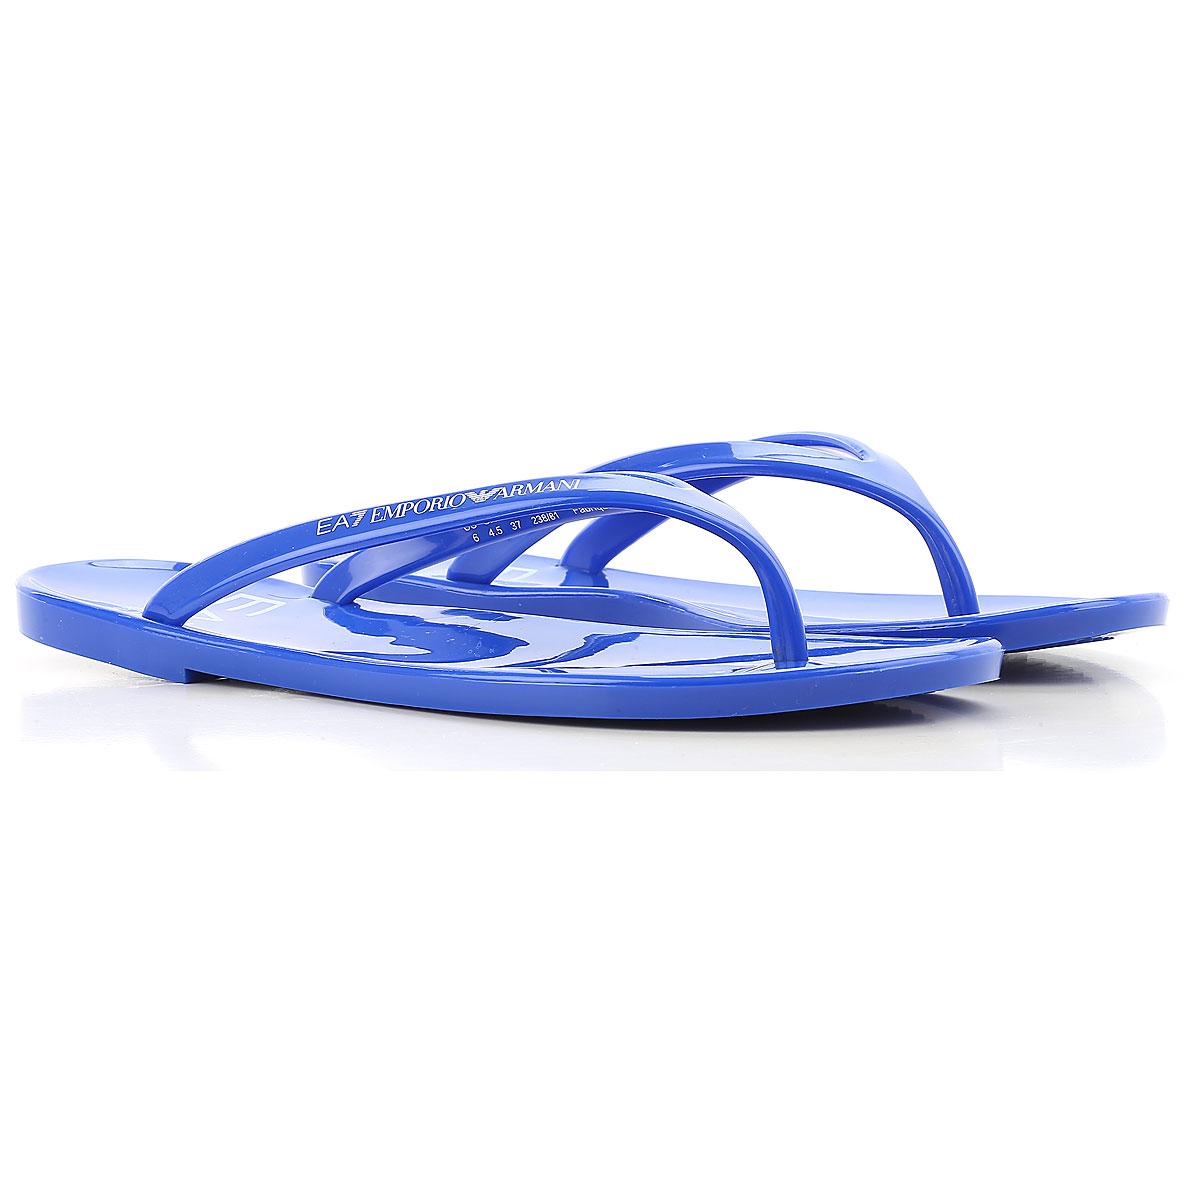 Image of Emporio Armani Flip Flops for Women, Thongs On Sale, Fluo Blue, PVC, 2017, US 6 - UK 4.5 - EU 37 US 9 - UK 7.5 - EU 41 US 6 - UK 5.5 - EU 38